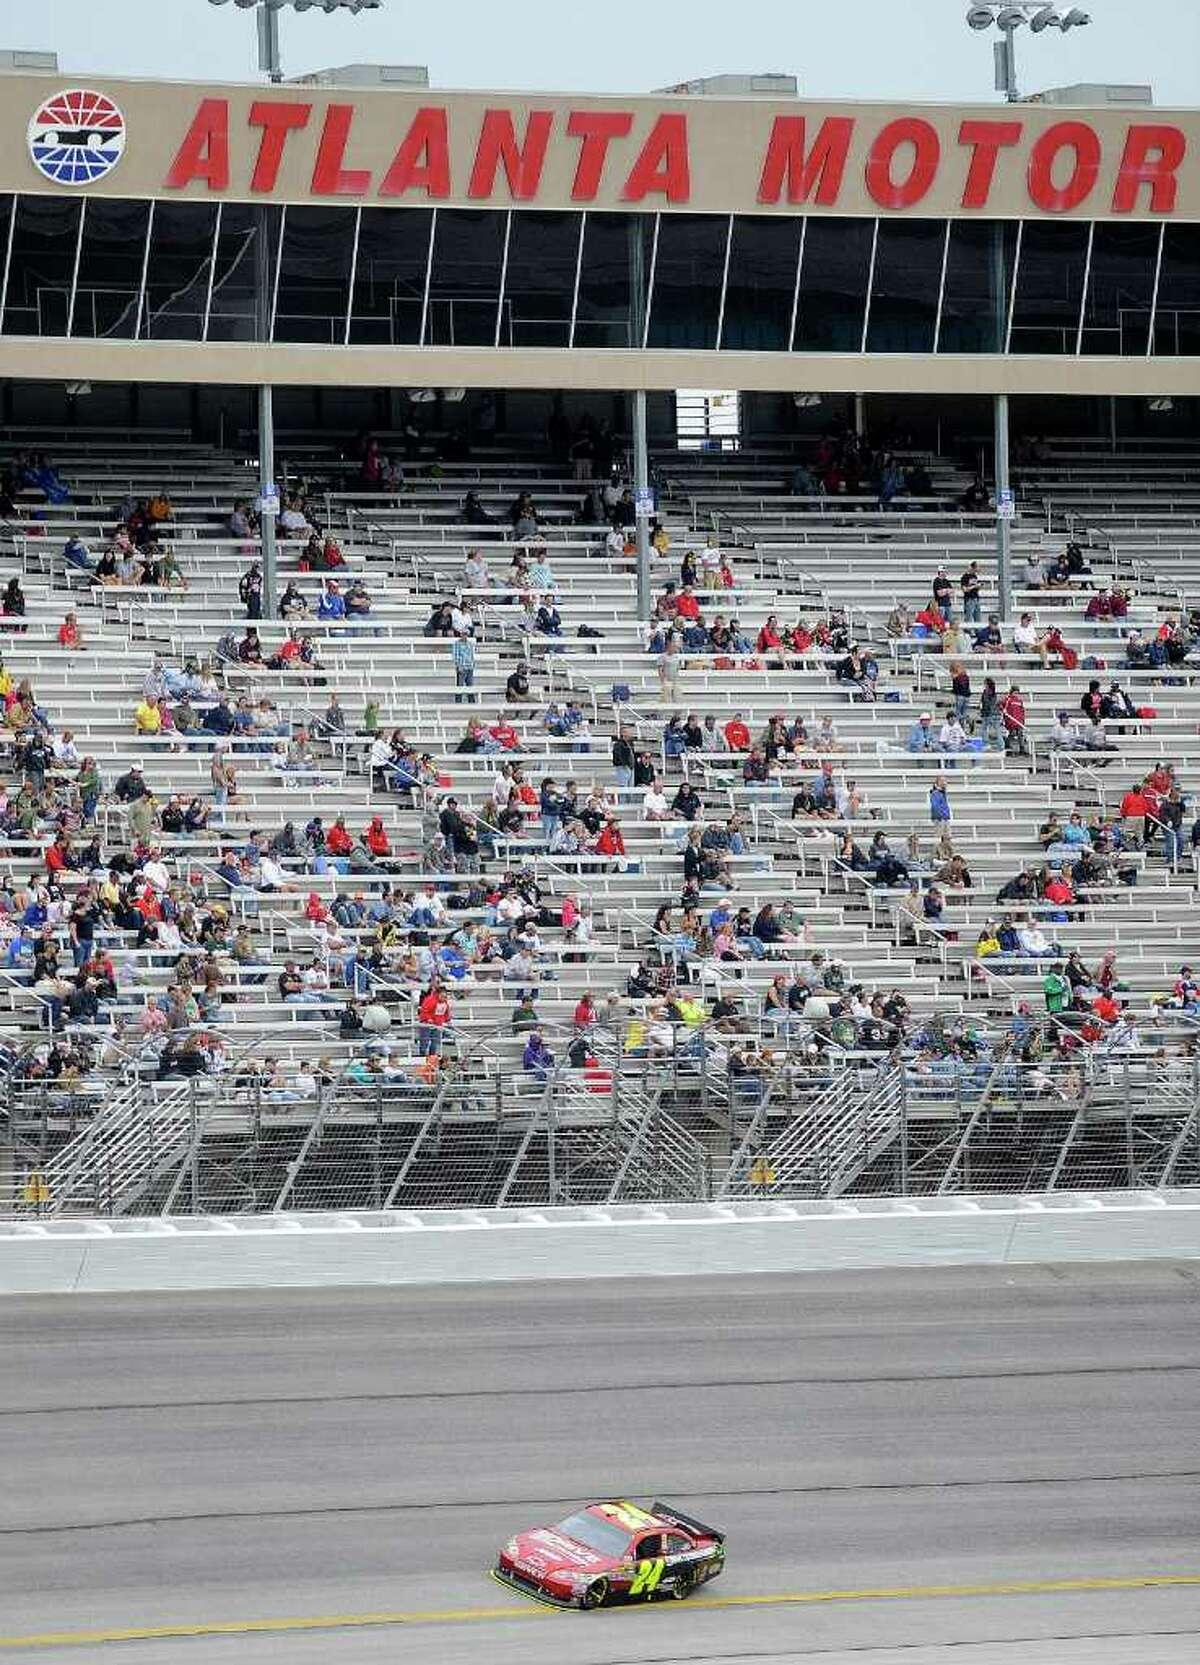 Sprint Cup Series driver Jeff Gordon races during the NASCAR Sprint Cup AdvoCare 500 auto race, Tuesday, Sept. 6, 2011, at the Atlanta Motor Speedway, near Hampton, Ga. Gordon won the race. (AP Photo/Mike Stewart)